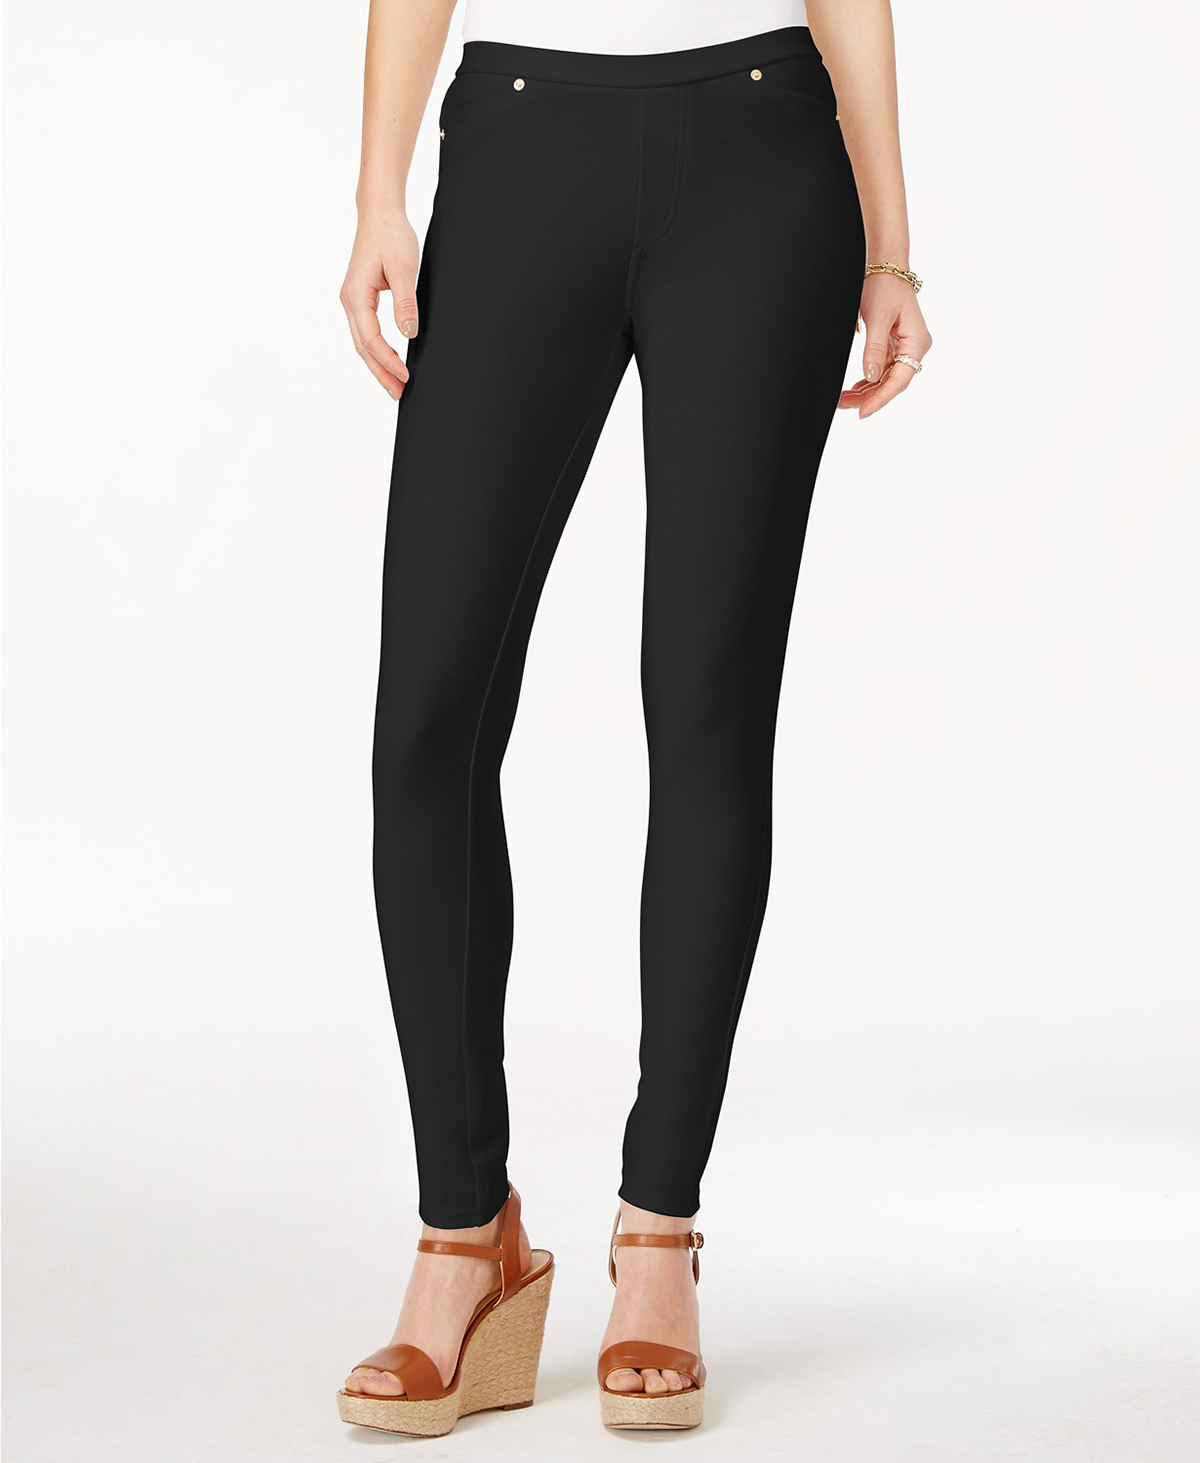 Michael Kors Black leggings